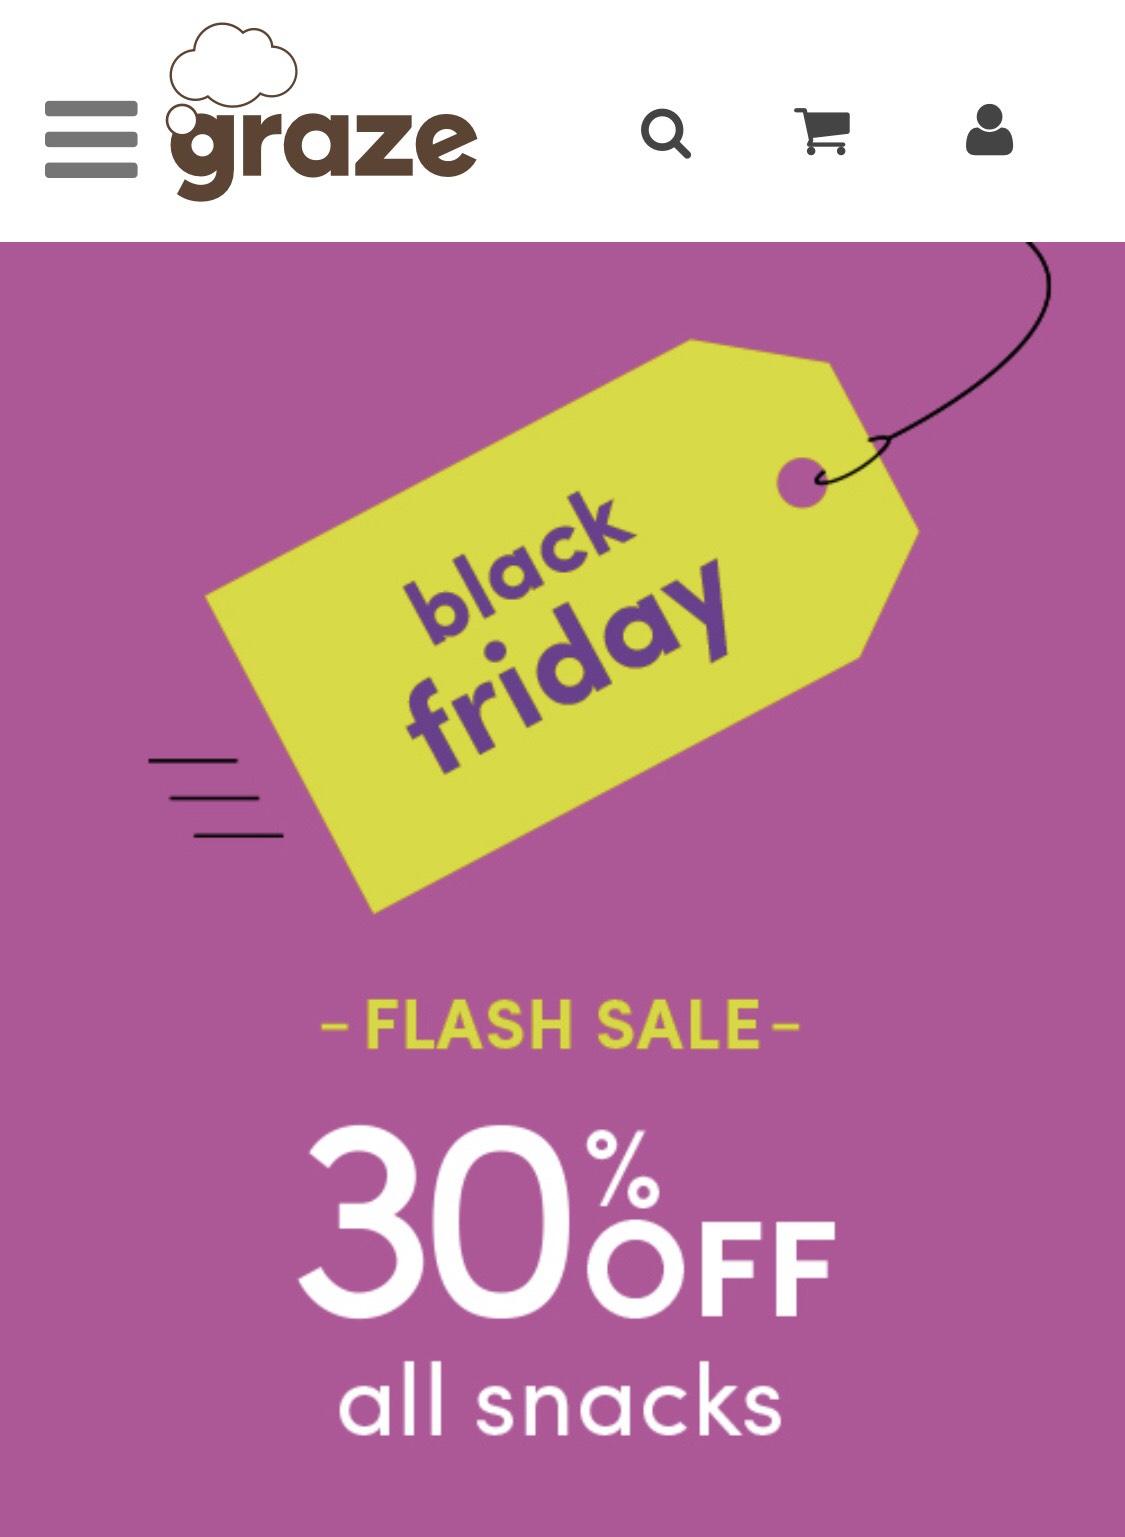 Graze Black Friday sale 30% off snacks